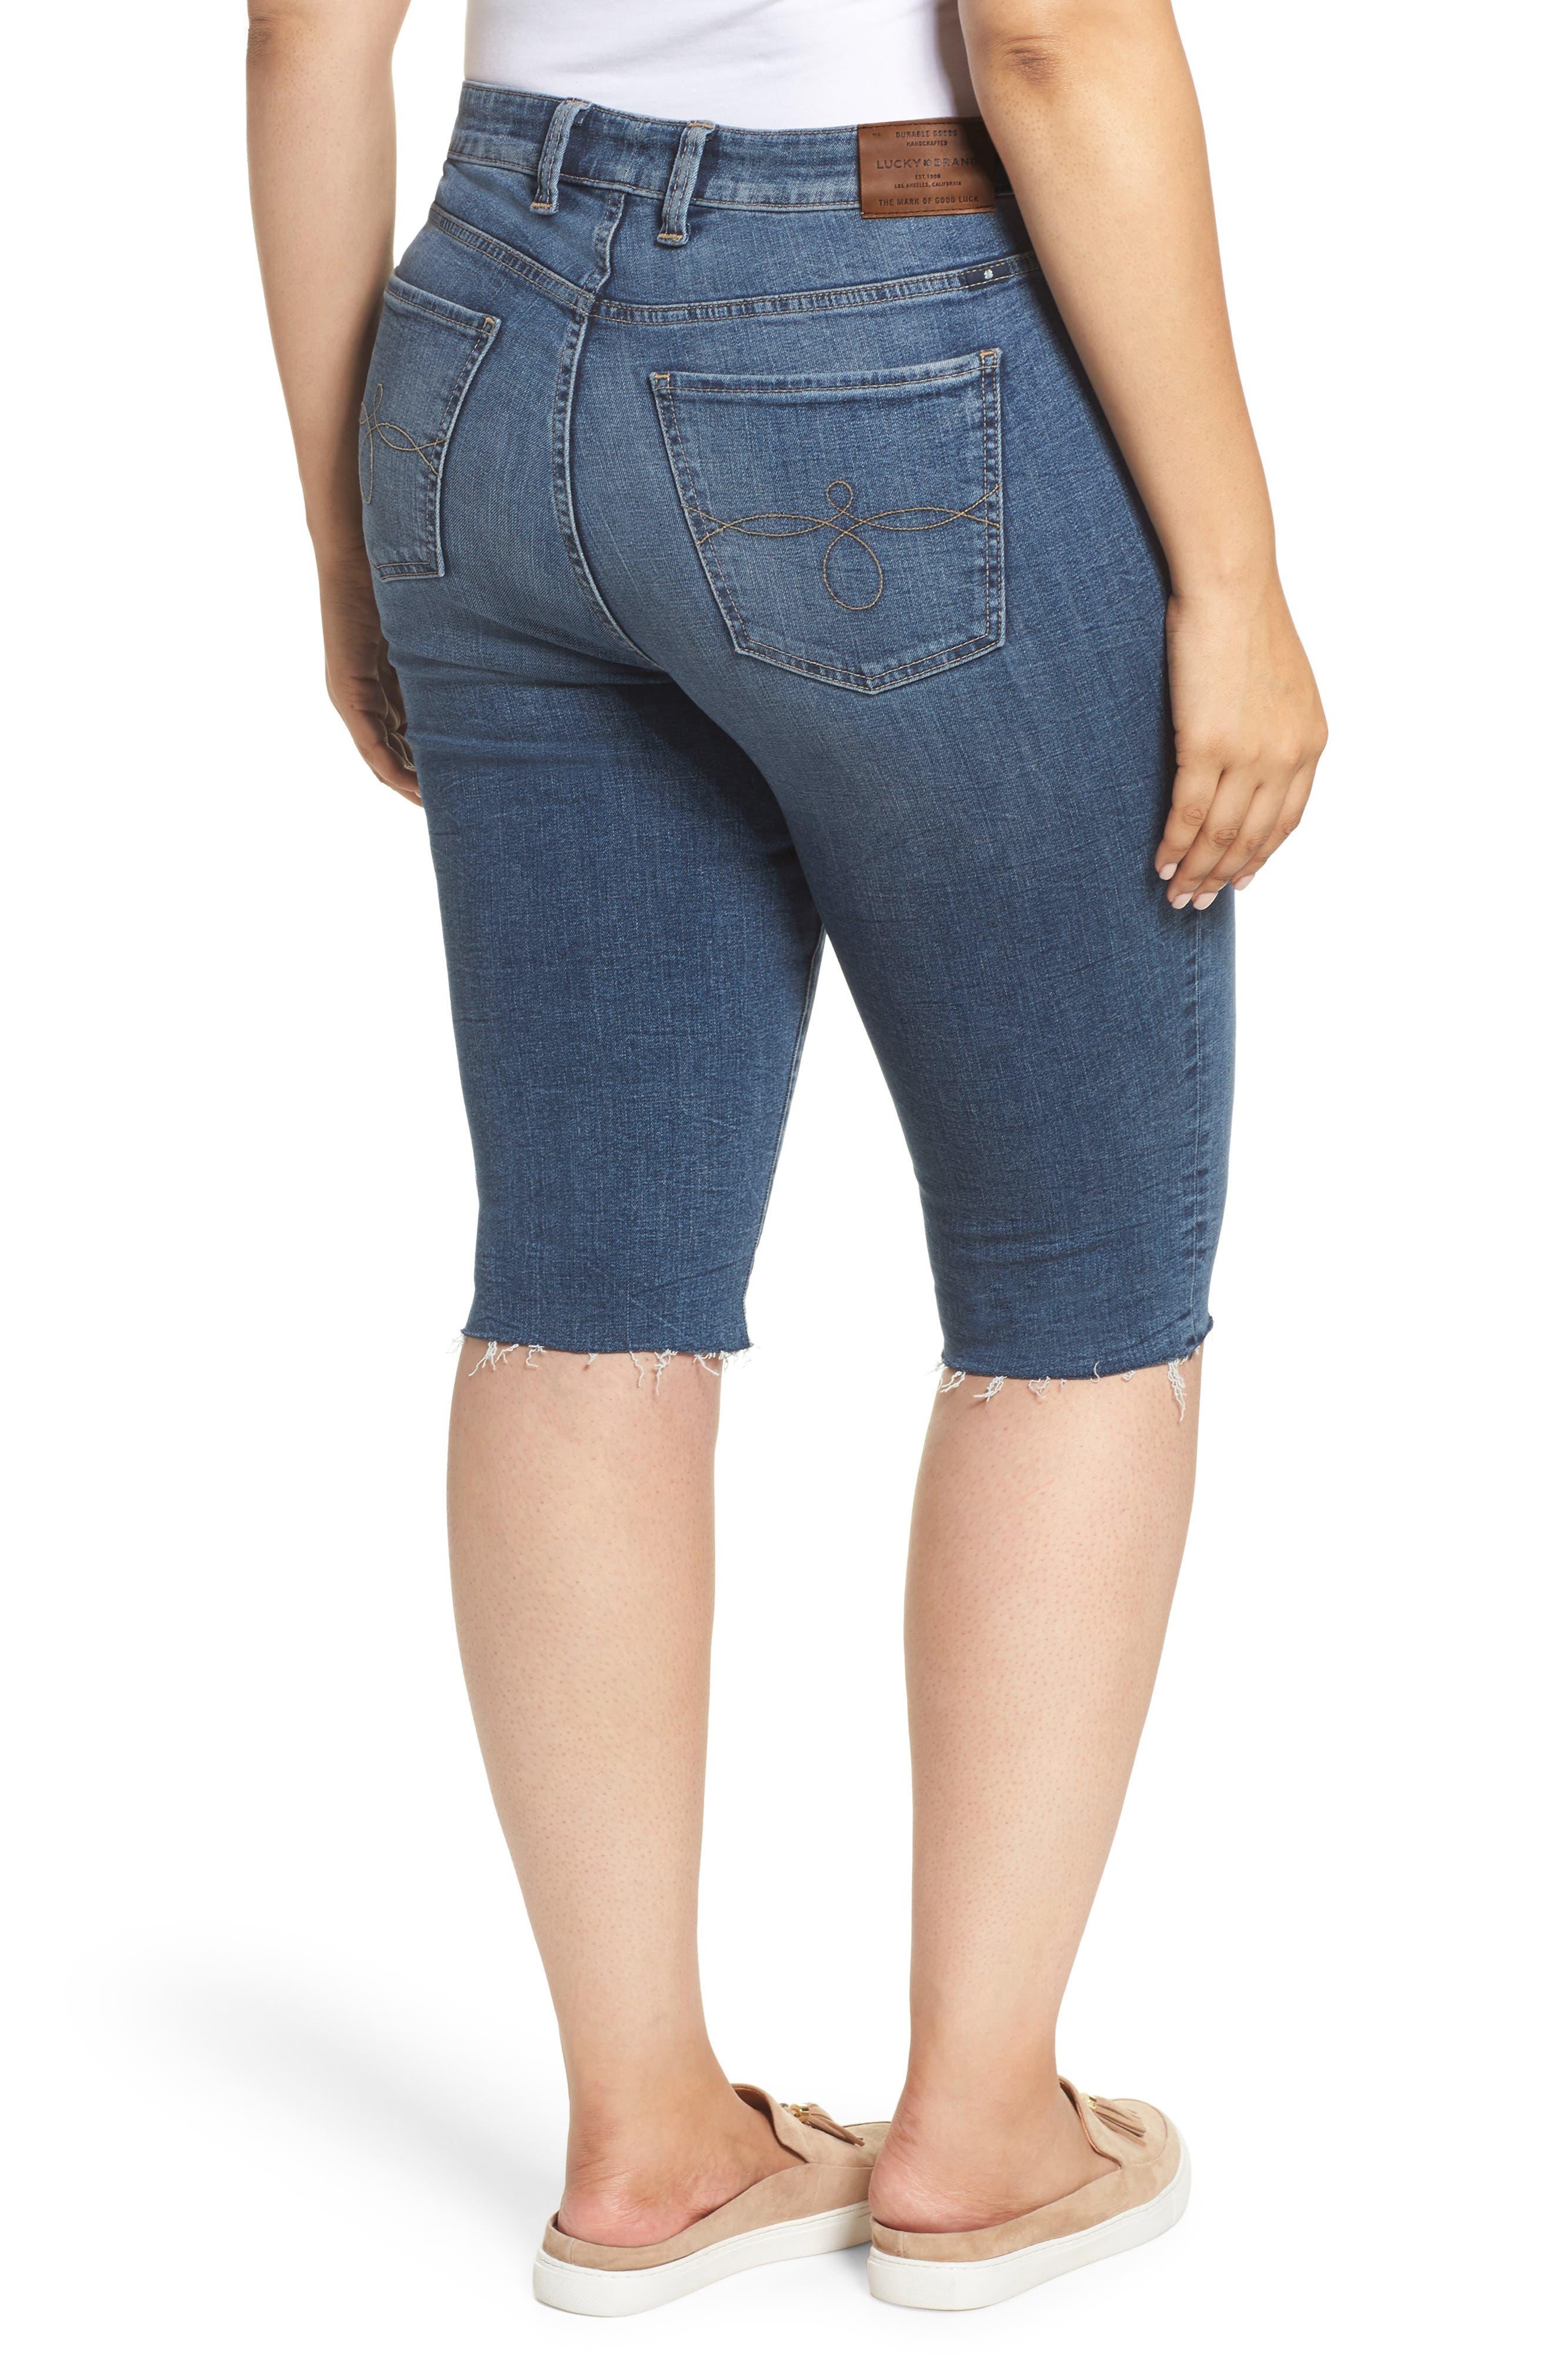 Ginger Bermuda Shorts,                             Alternate thumbnail 2, color,                             430